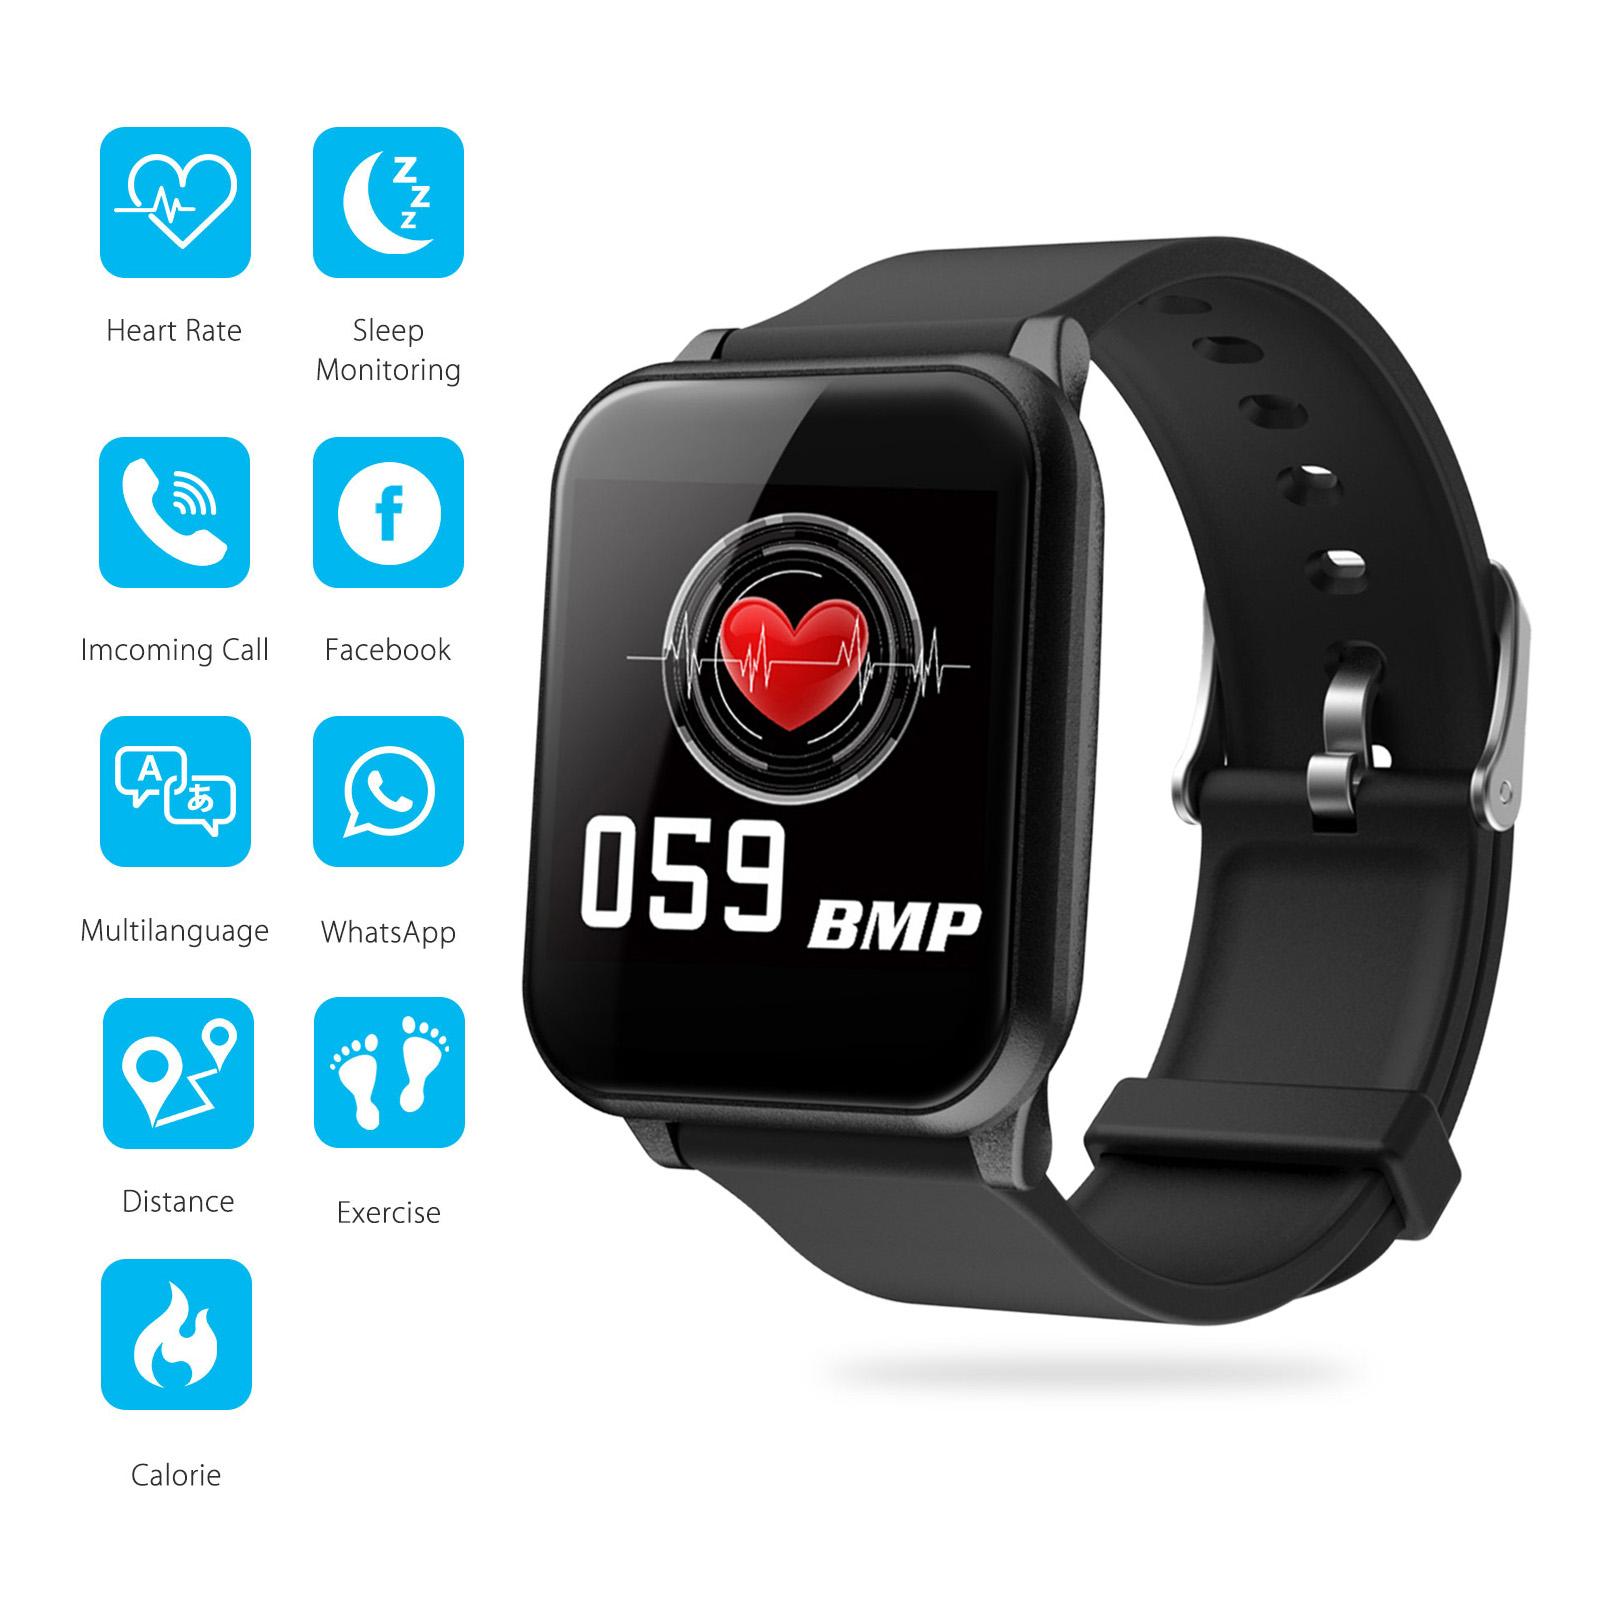 Smart Watch Heart Rate Monitor Fitness Tracker Activity Spor